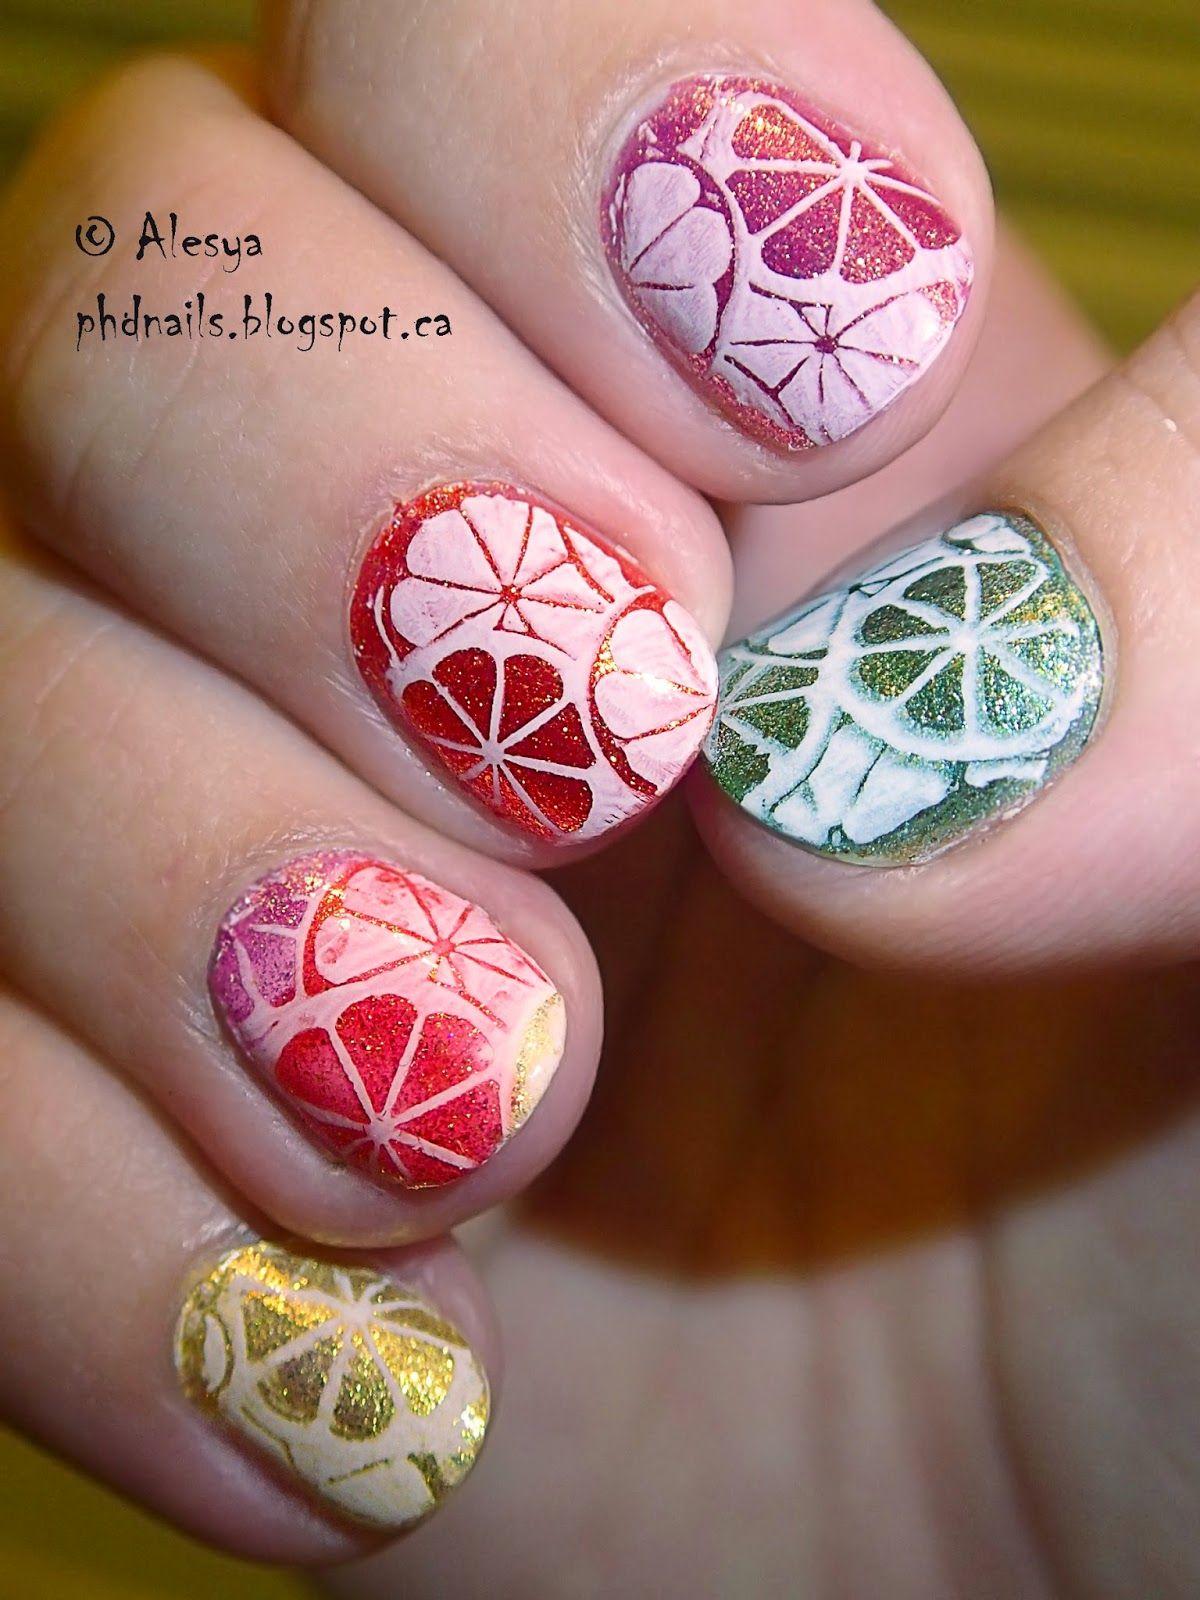 Zoya polish citrus nail art nails pinterest art challenge zoya polish citrus nail art prinsesfo Gallery